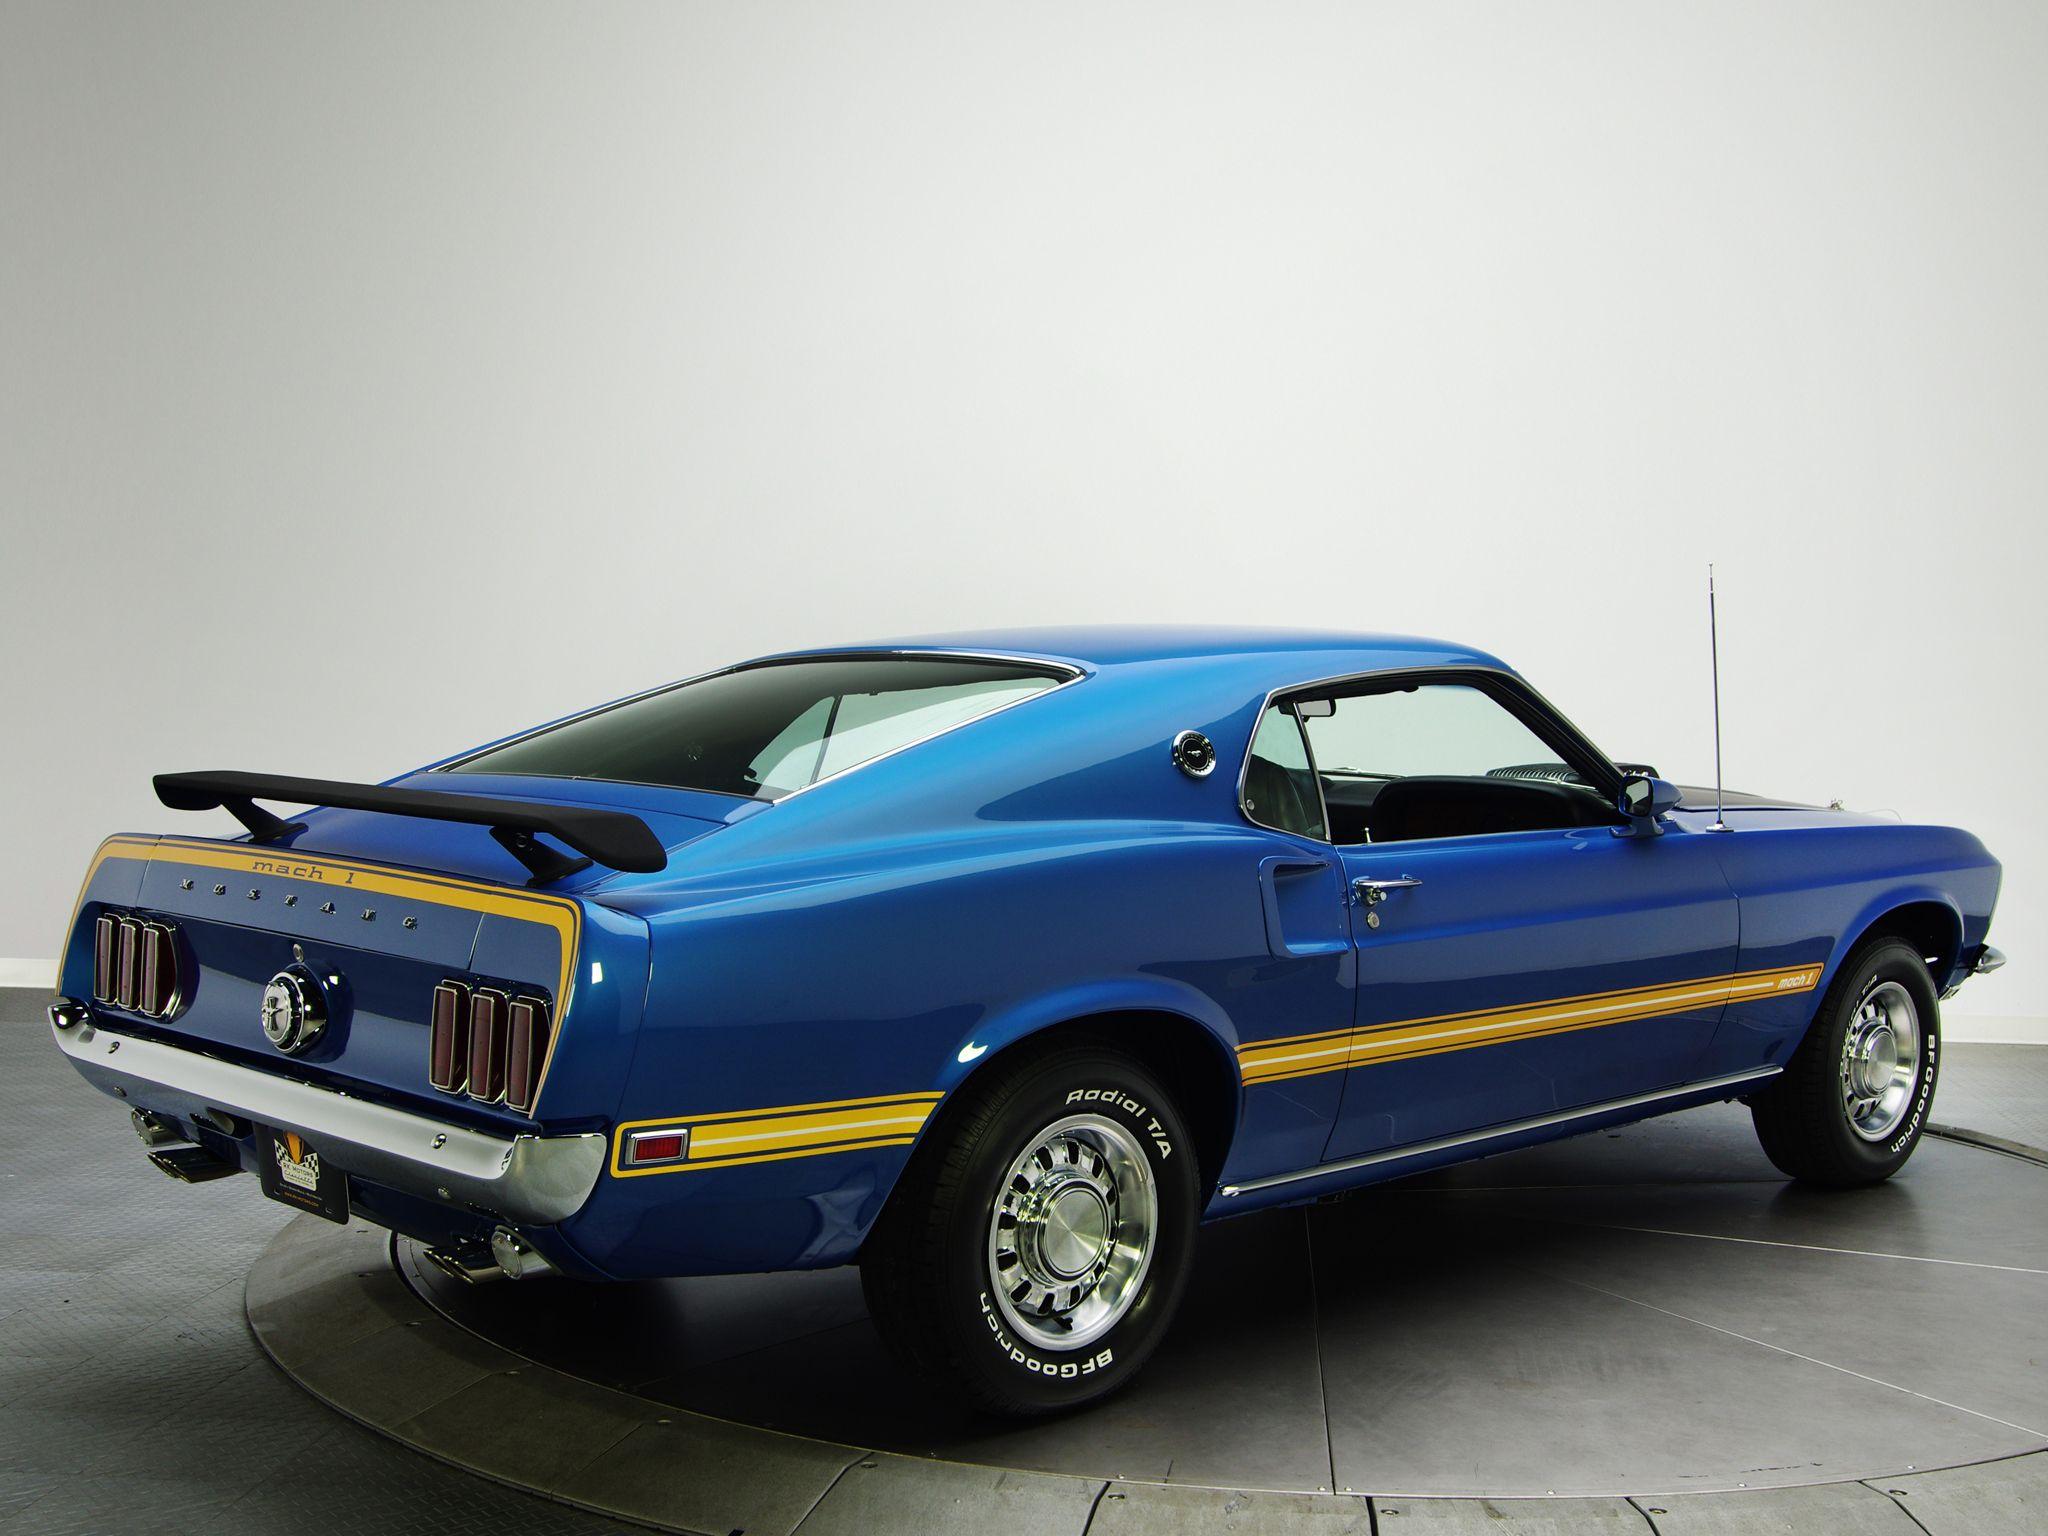 1969 Mustang Mach 1 428 Super Cobra Jet Mustang Mach 1 Mustang 1969 Mustang Fastback